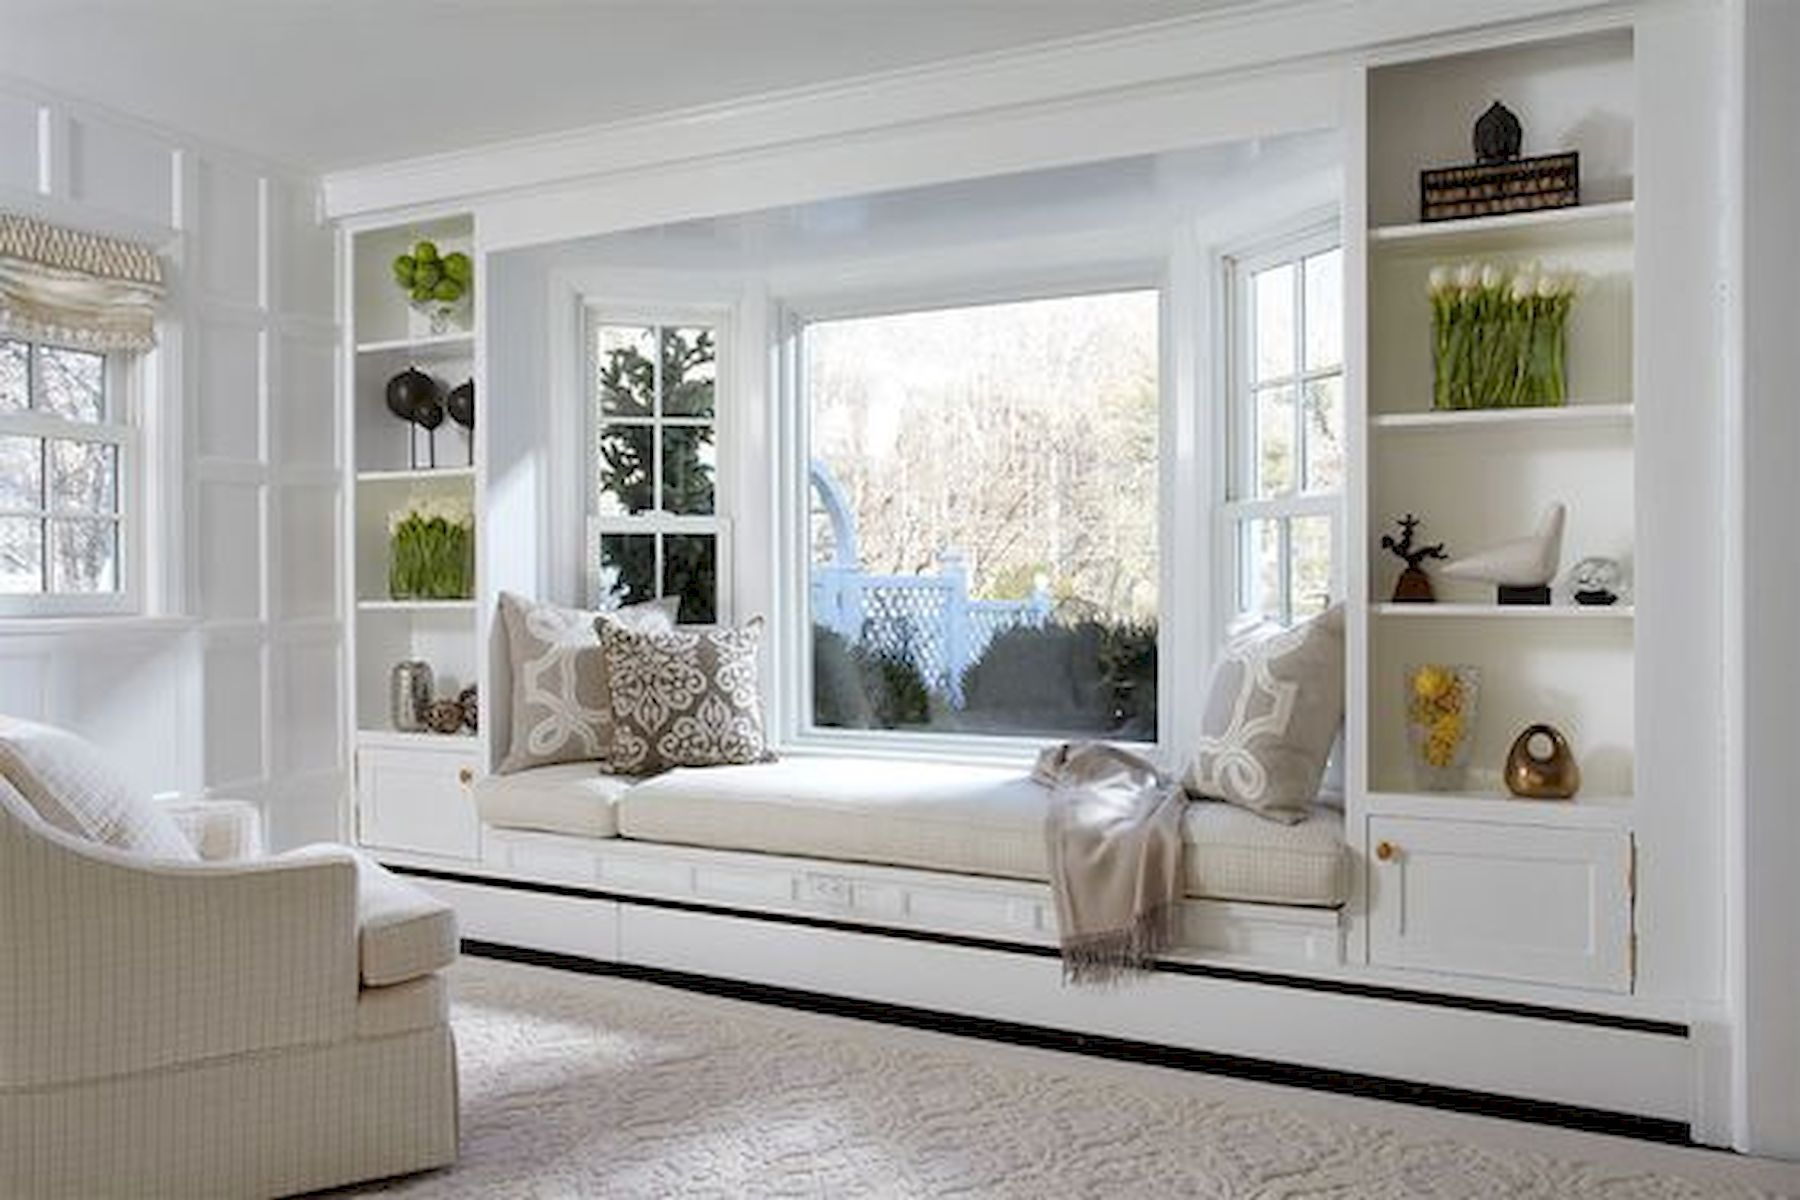 Bay window ideas bedroom  interior design chic window seats   creative cabin chic room